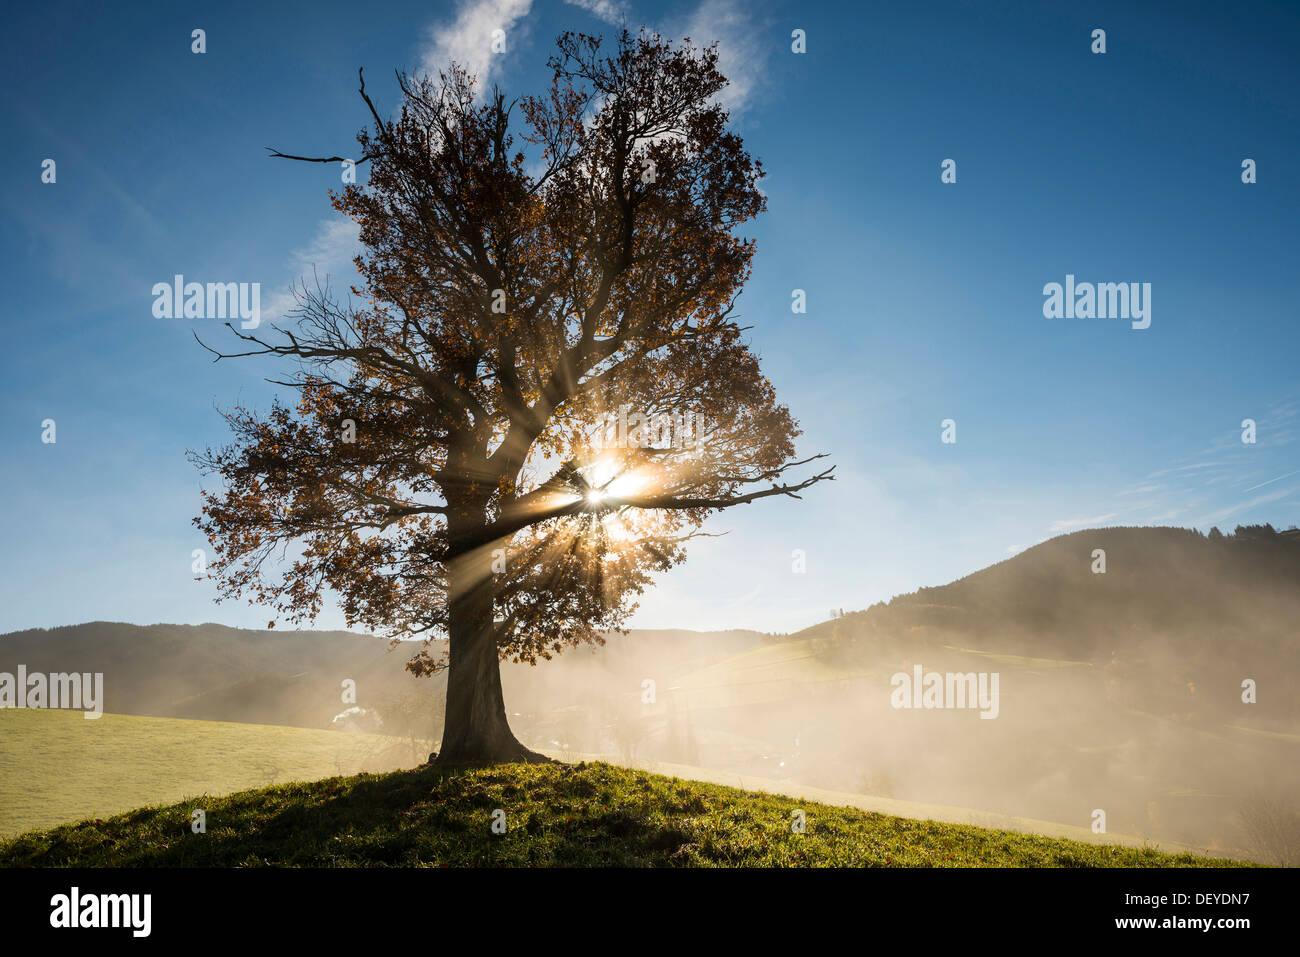 Oak Beams Stockfotos & Oak Beams Bilder - Seite 2 - Alamy